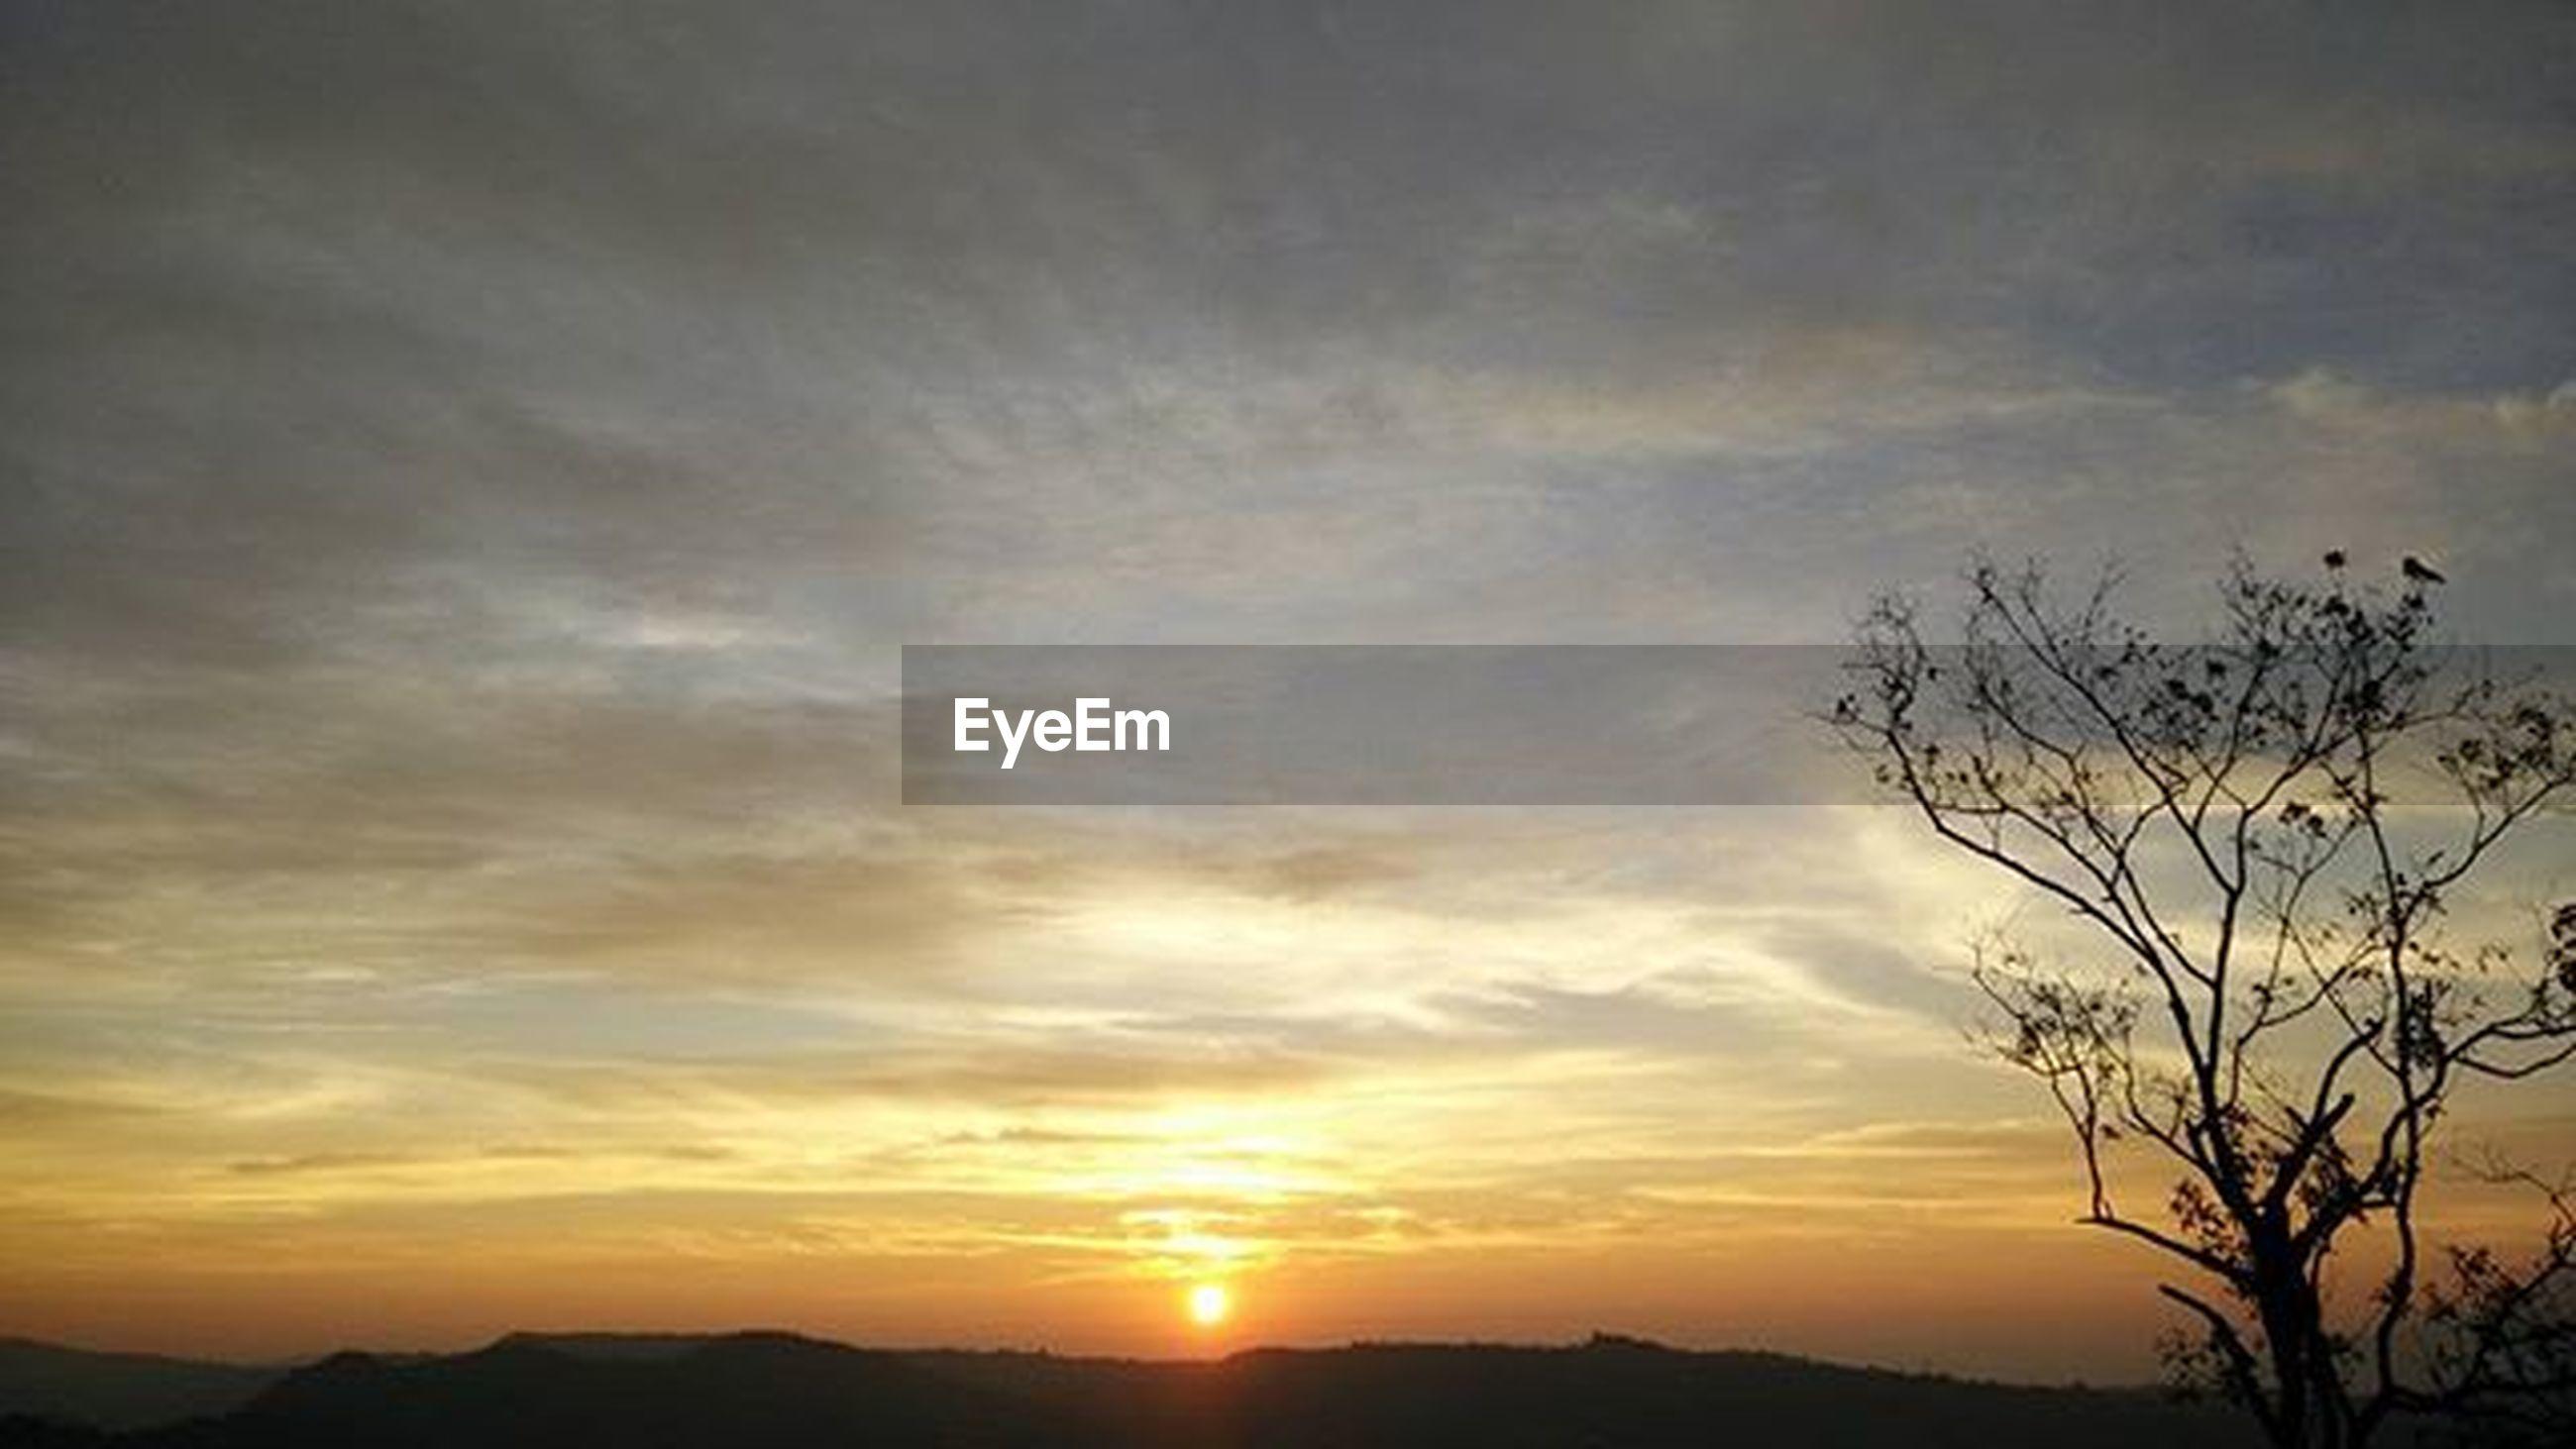 sunset, silhouette, scenics, tranquil scene, sky, tranquility, beauty in nature, orange color, sun, landscape, nature, cloud - sky, idyllic, mountain, cloud, sunlight, dramatic sky, majestic, outdoors, non-urban scene